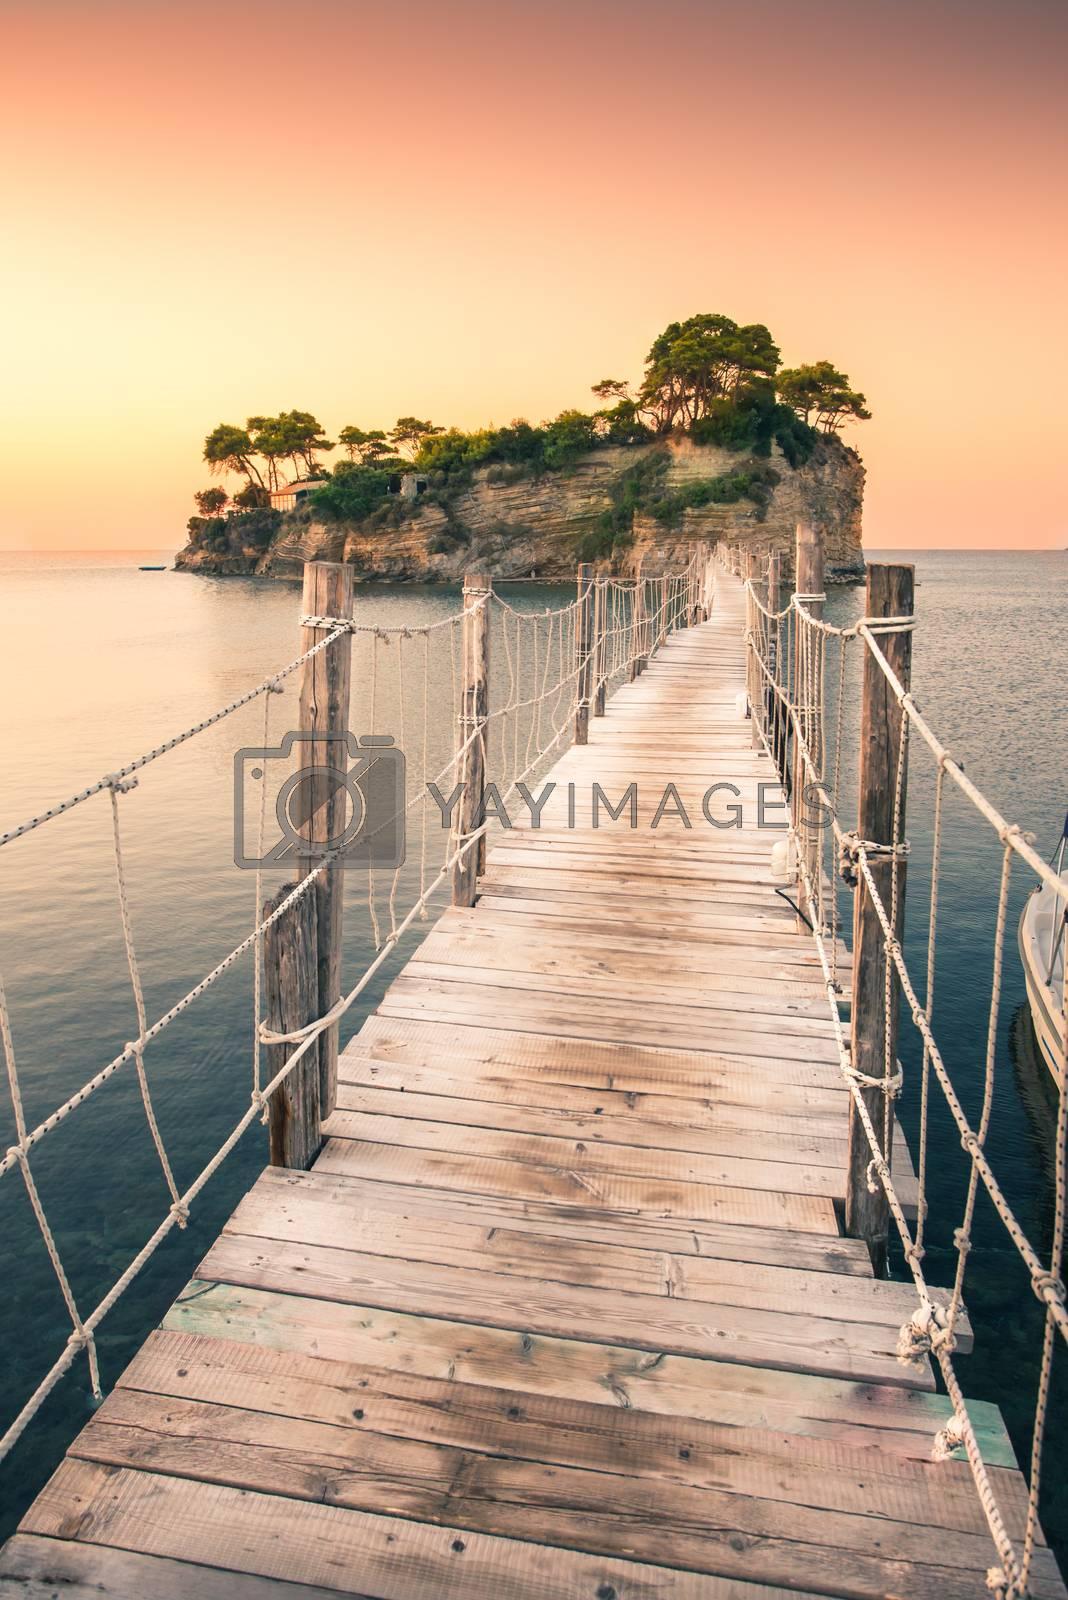 Royalty free image of The sunrise at Agios Sostis Island, Cameo Island in Zakynthos, Greece. Wooden bridge. by petrsvoboda91